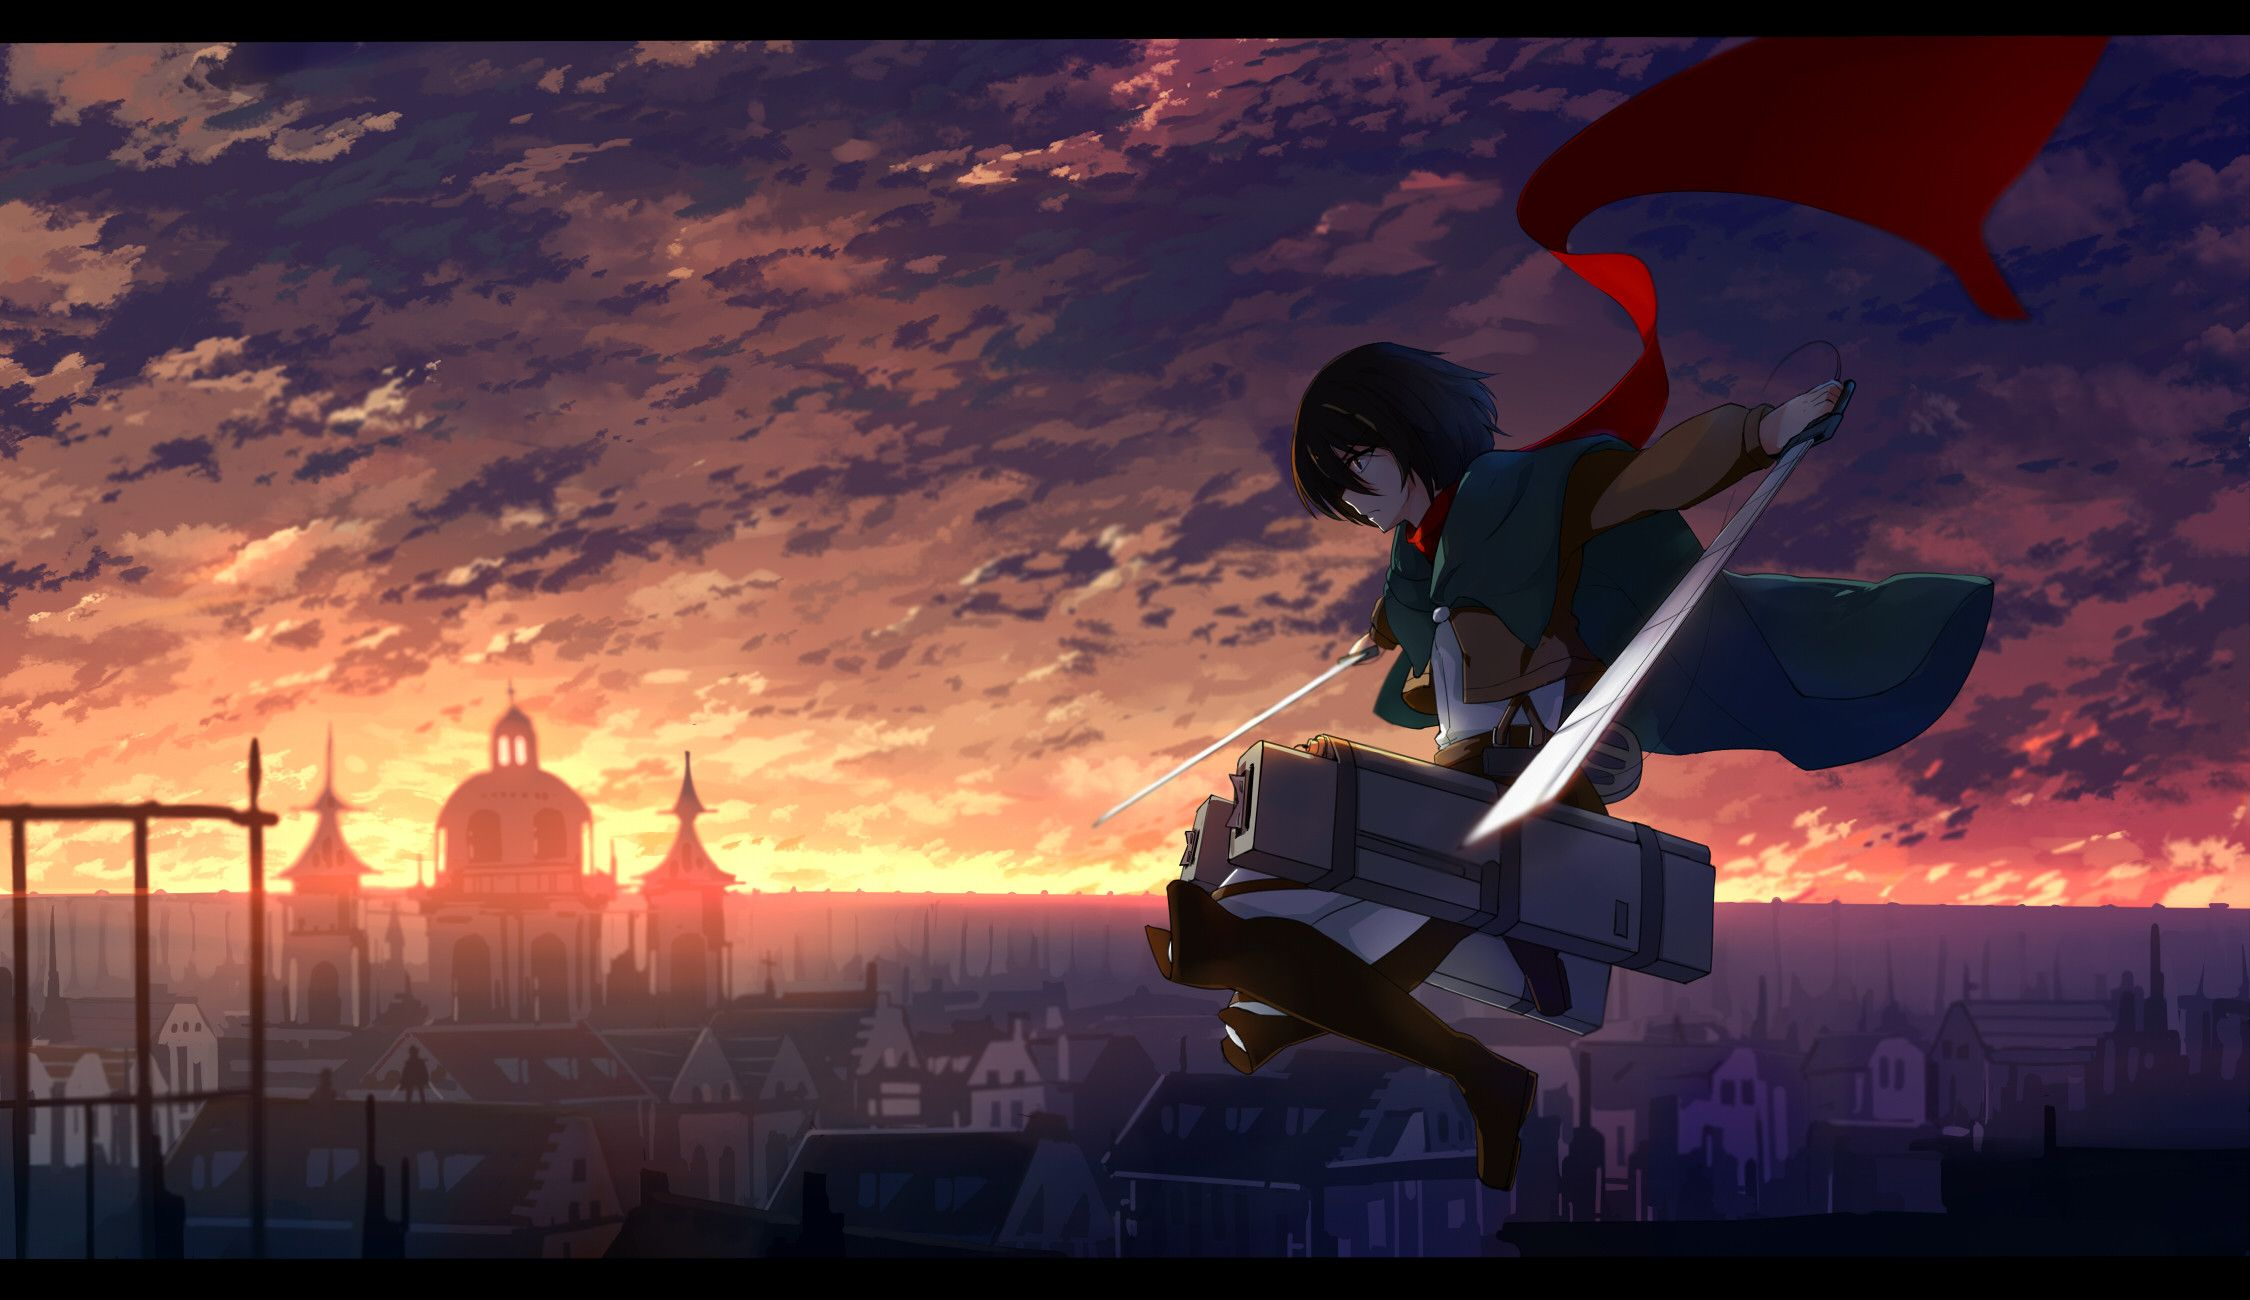 2250x1300 Attack On Titan Wallpaper Anime Wallpaper 1920x1080 Attack On Titan Art Anime Wallpaper